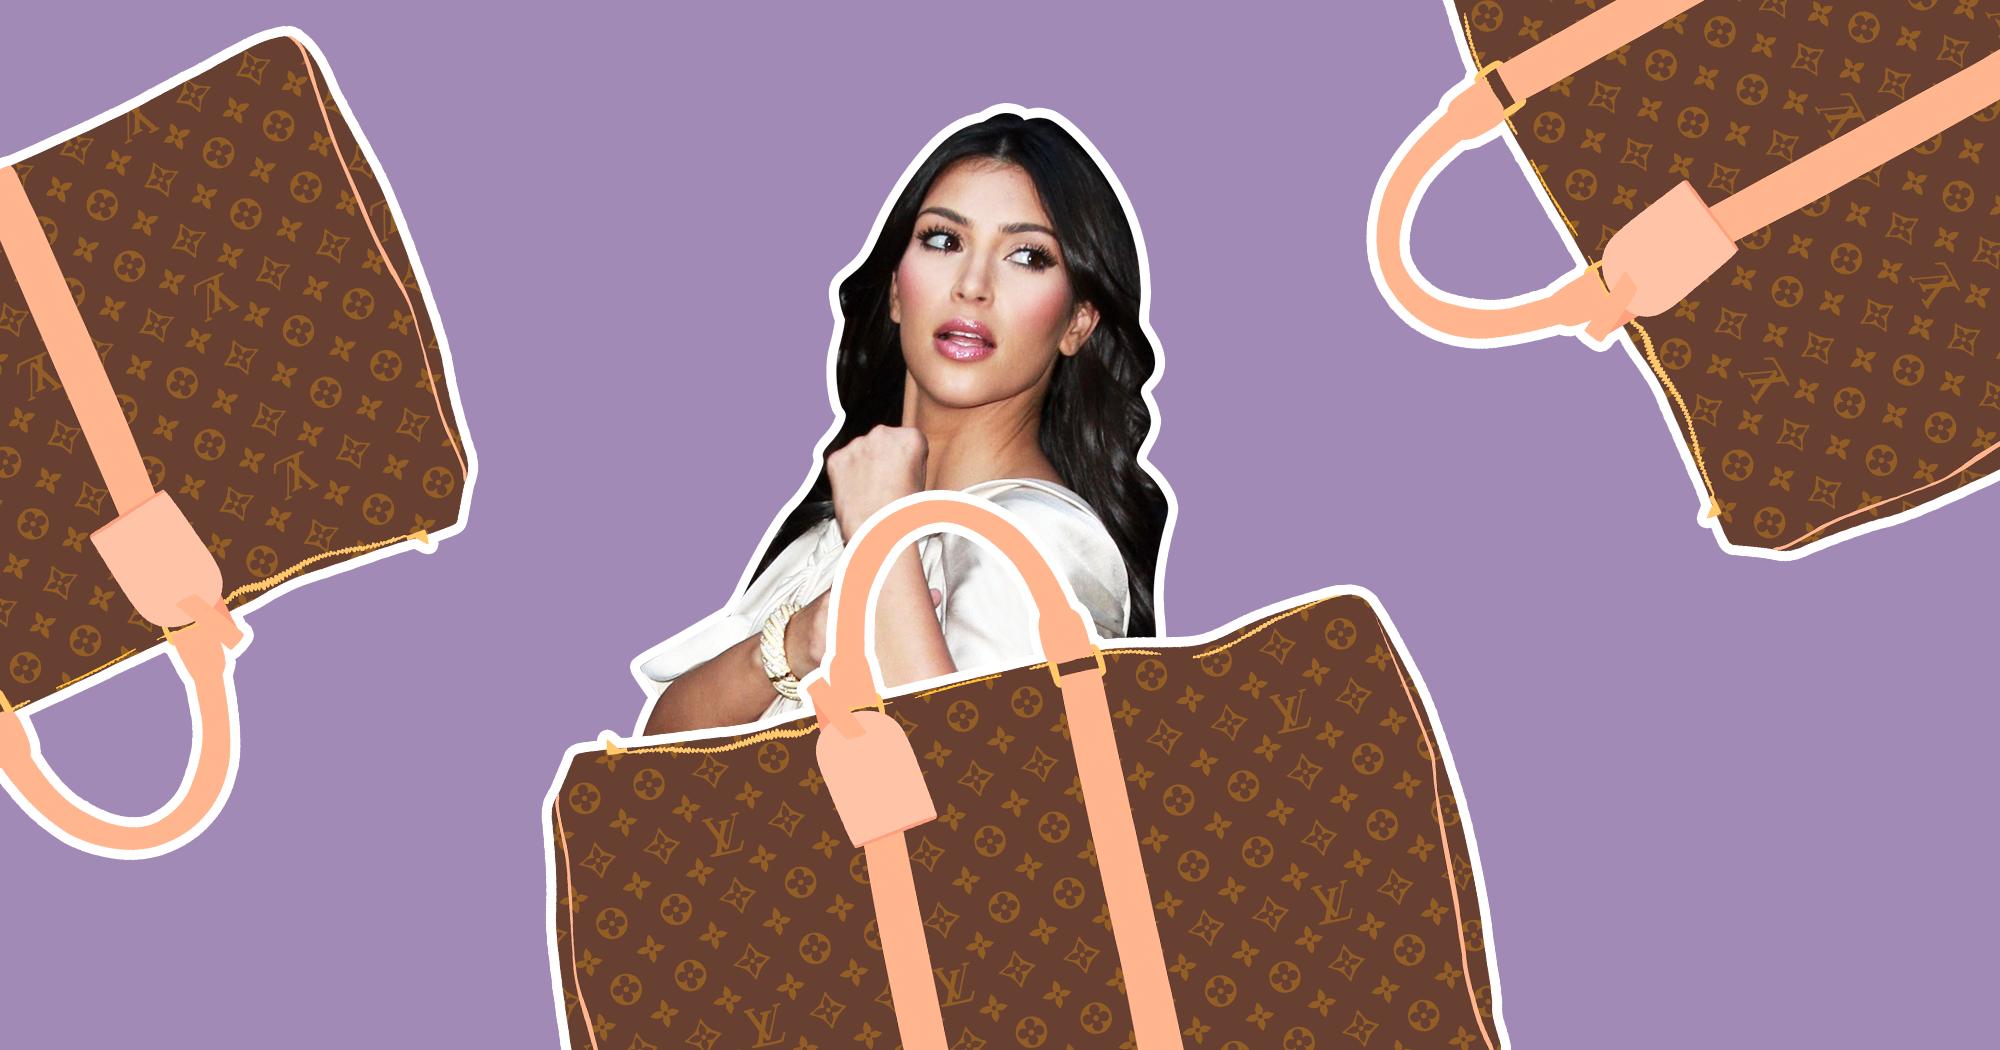 Kim Kardashian West Louis Vuitton Bags Trend History X8 Kendrick T Shirt Size M